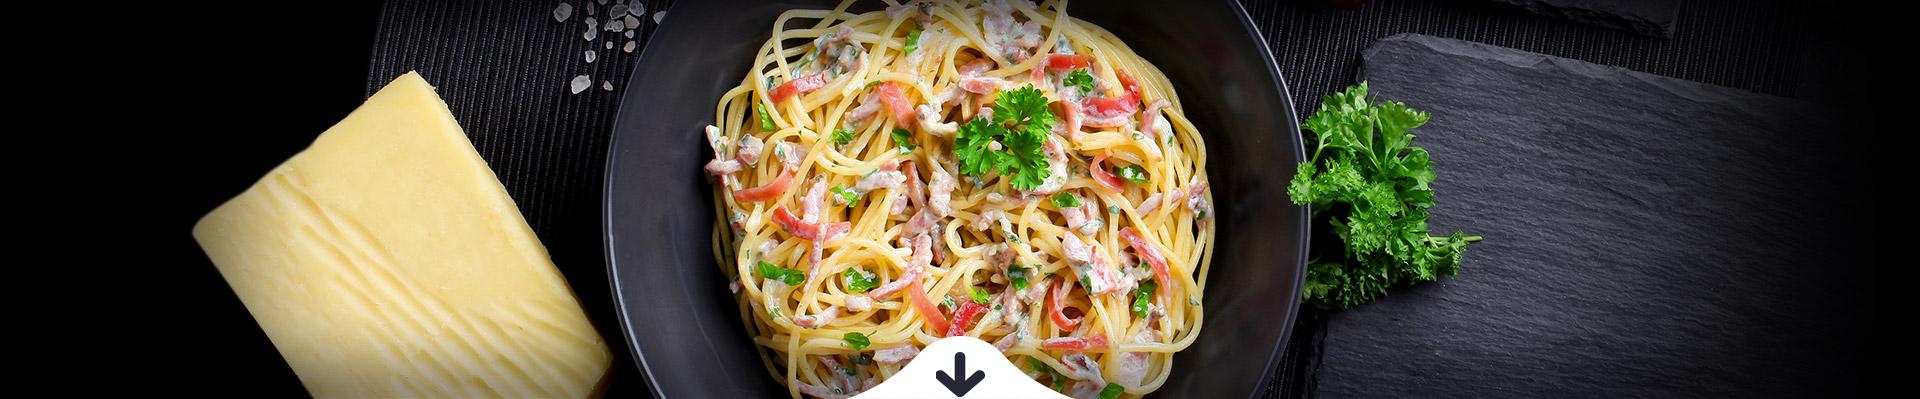 HELLO FOOD Spagetti carbonara